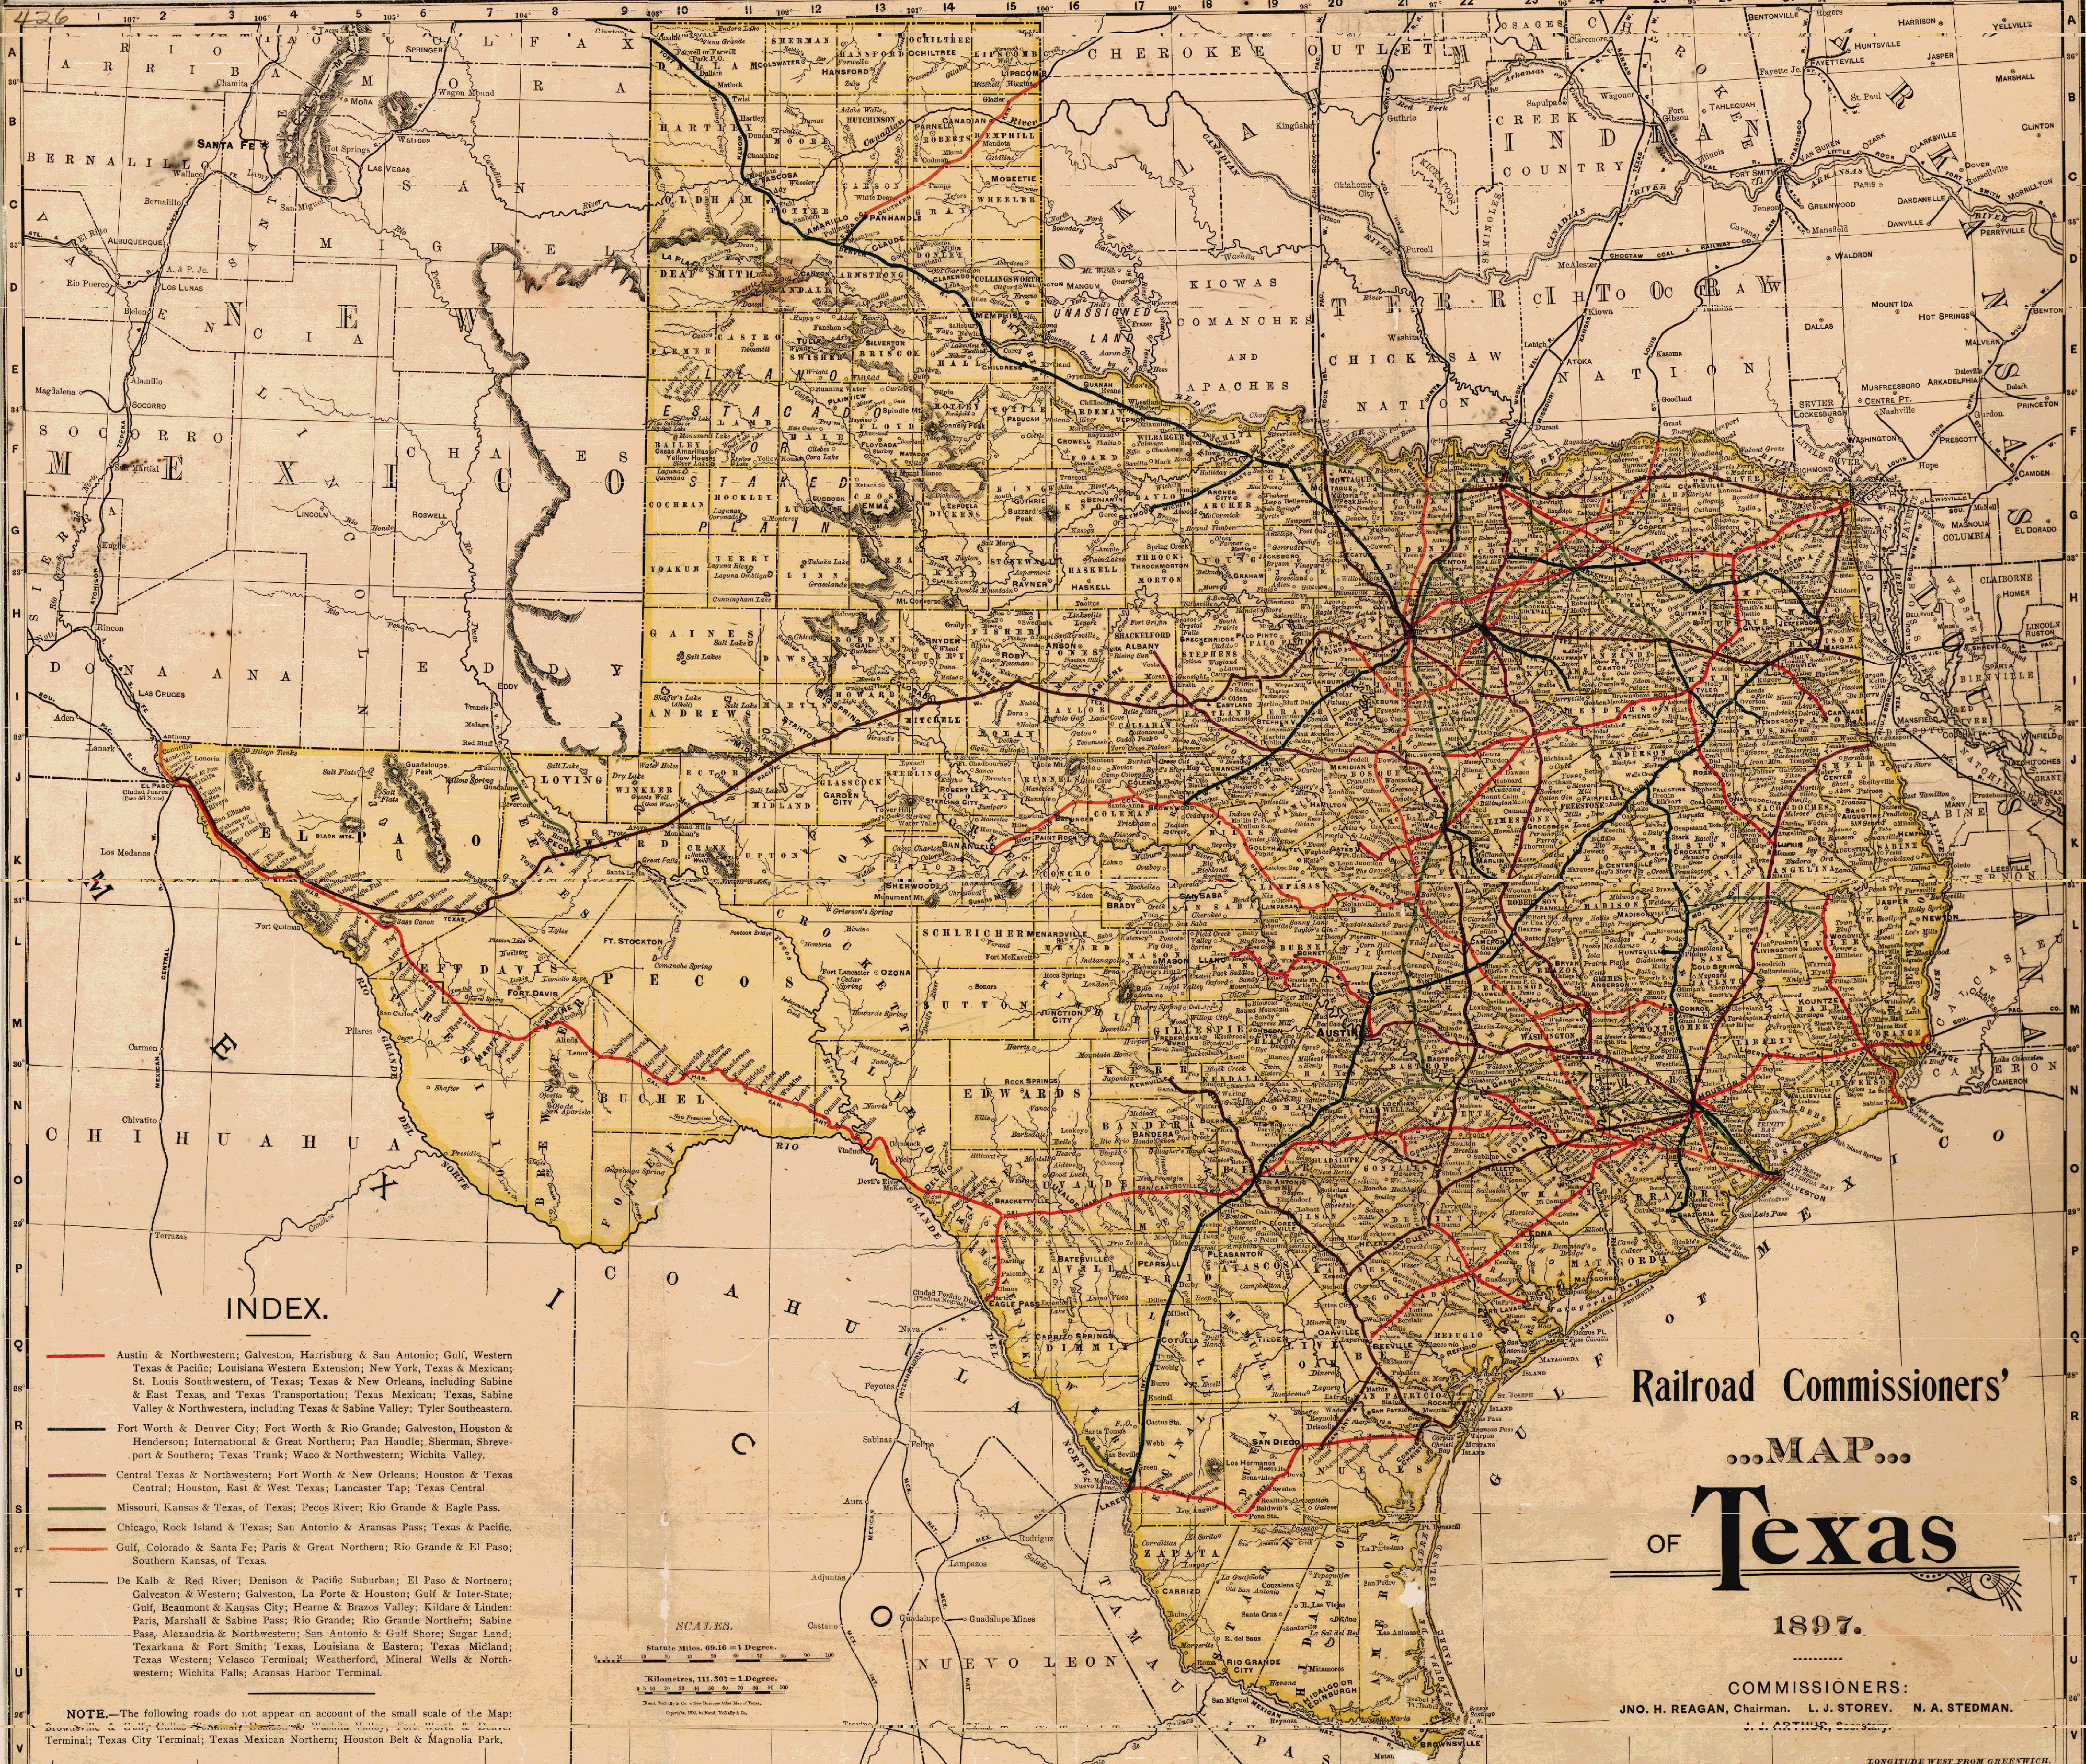 3990X3375Px Texas Computer Wallpaper - Wallpapersafari - Texas Map Wallpaper